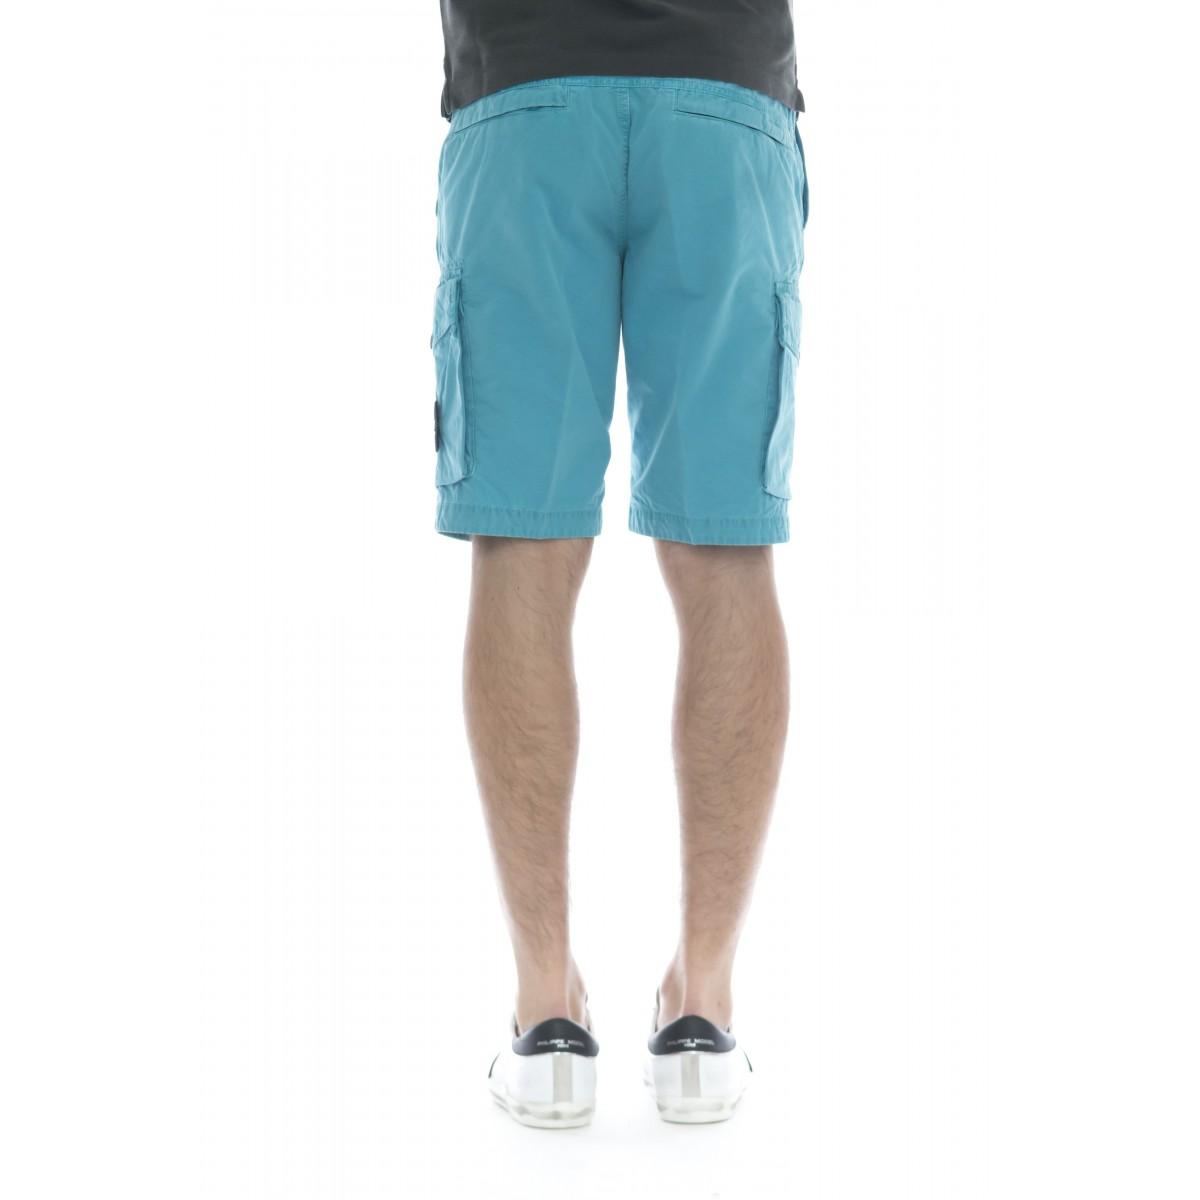 Bermuda shorts - L07WA pocket bermuda shorts